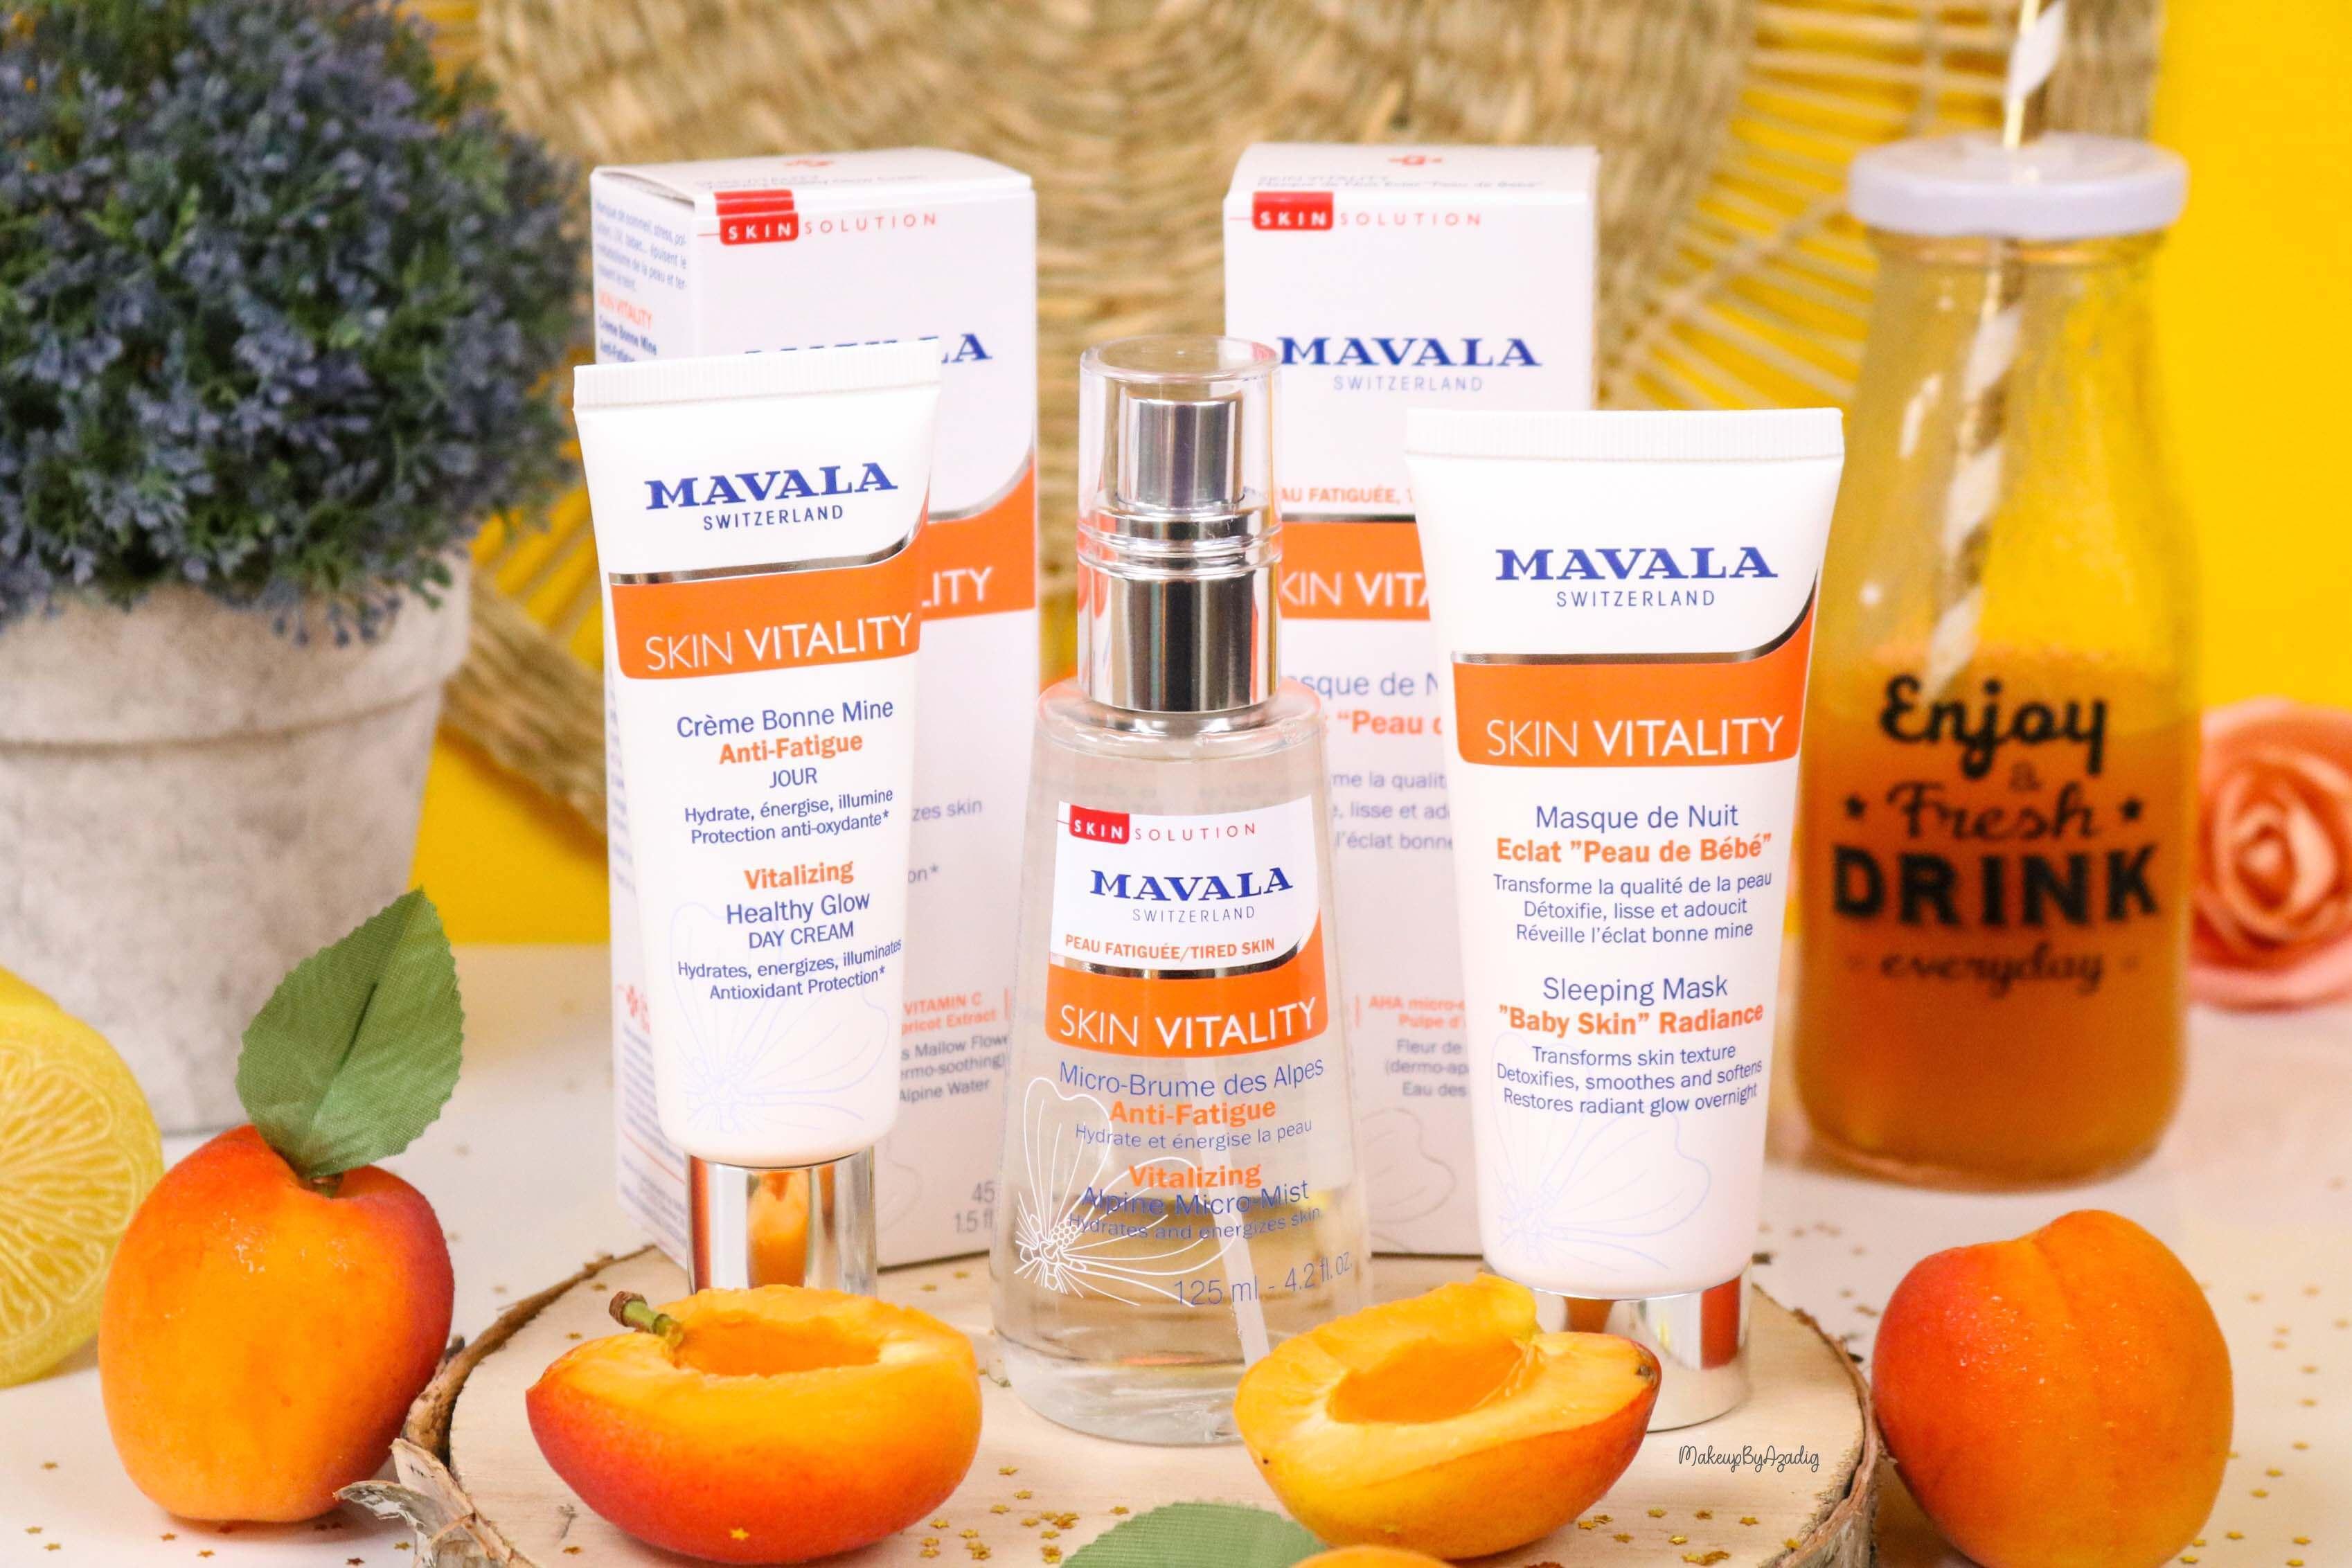 revue-routine-soin-bio-efficace-peau-sensible-skin-vitality-mavala-suisse-masque-nuit-serum-creme-jour-makeupbyazadig-skincare